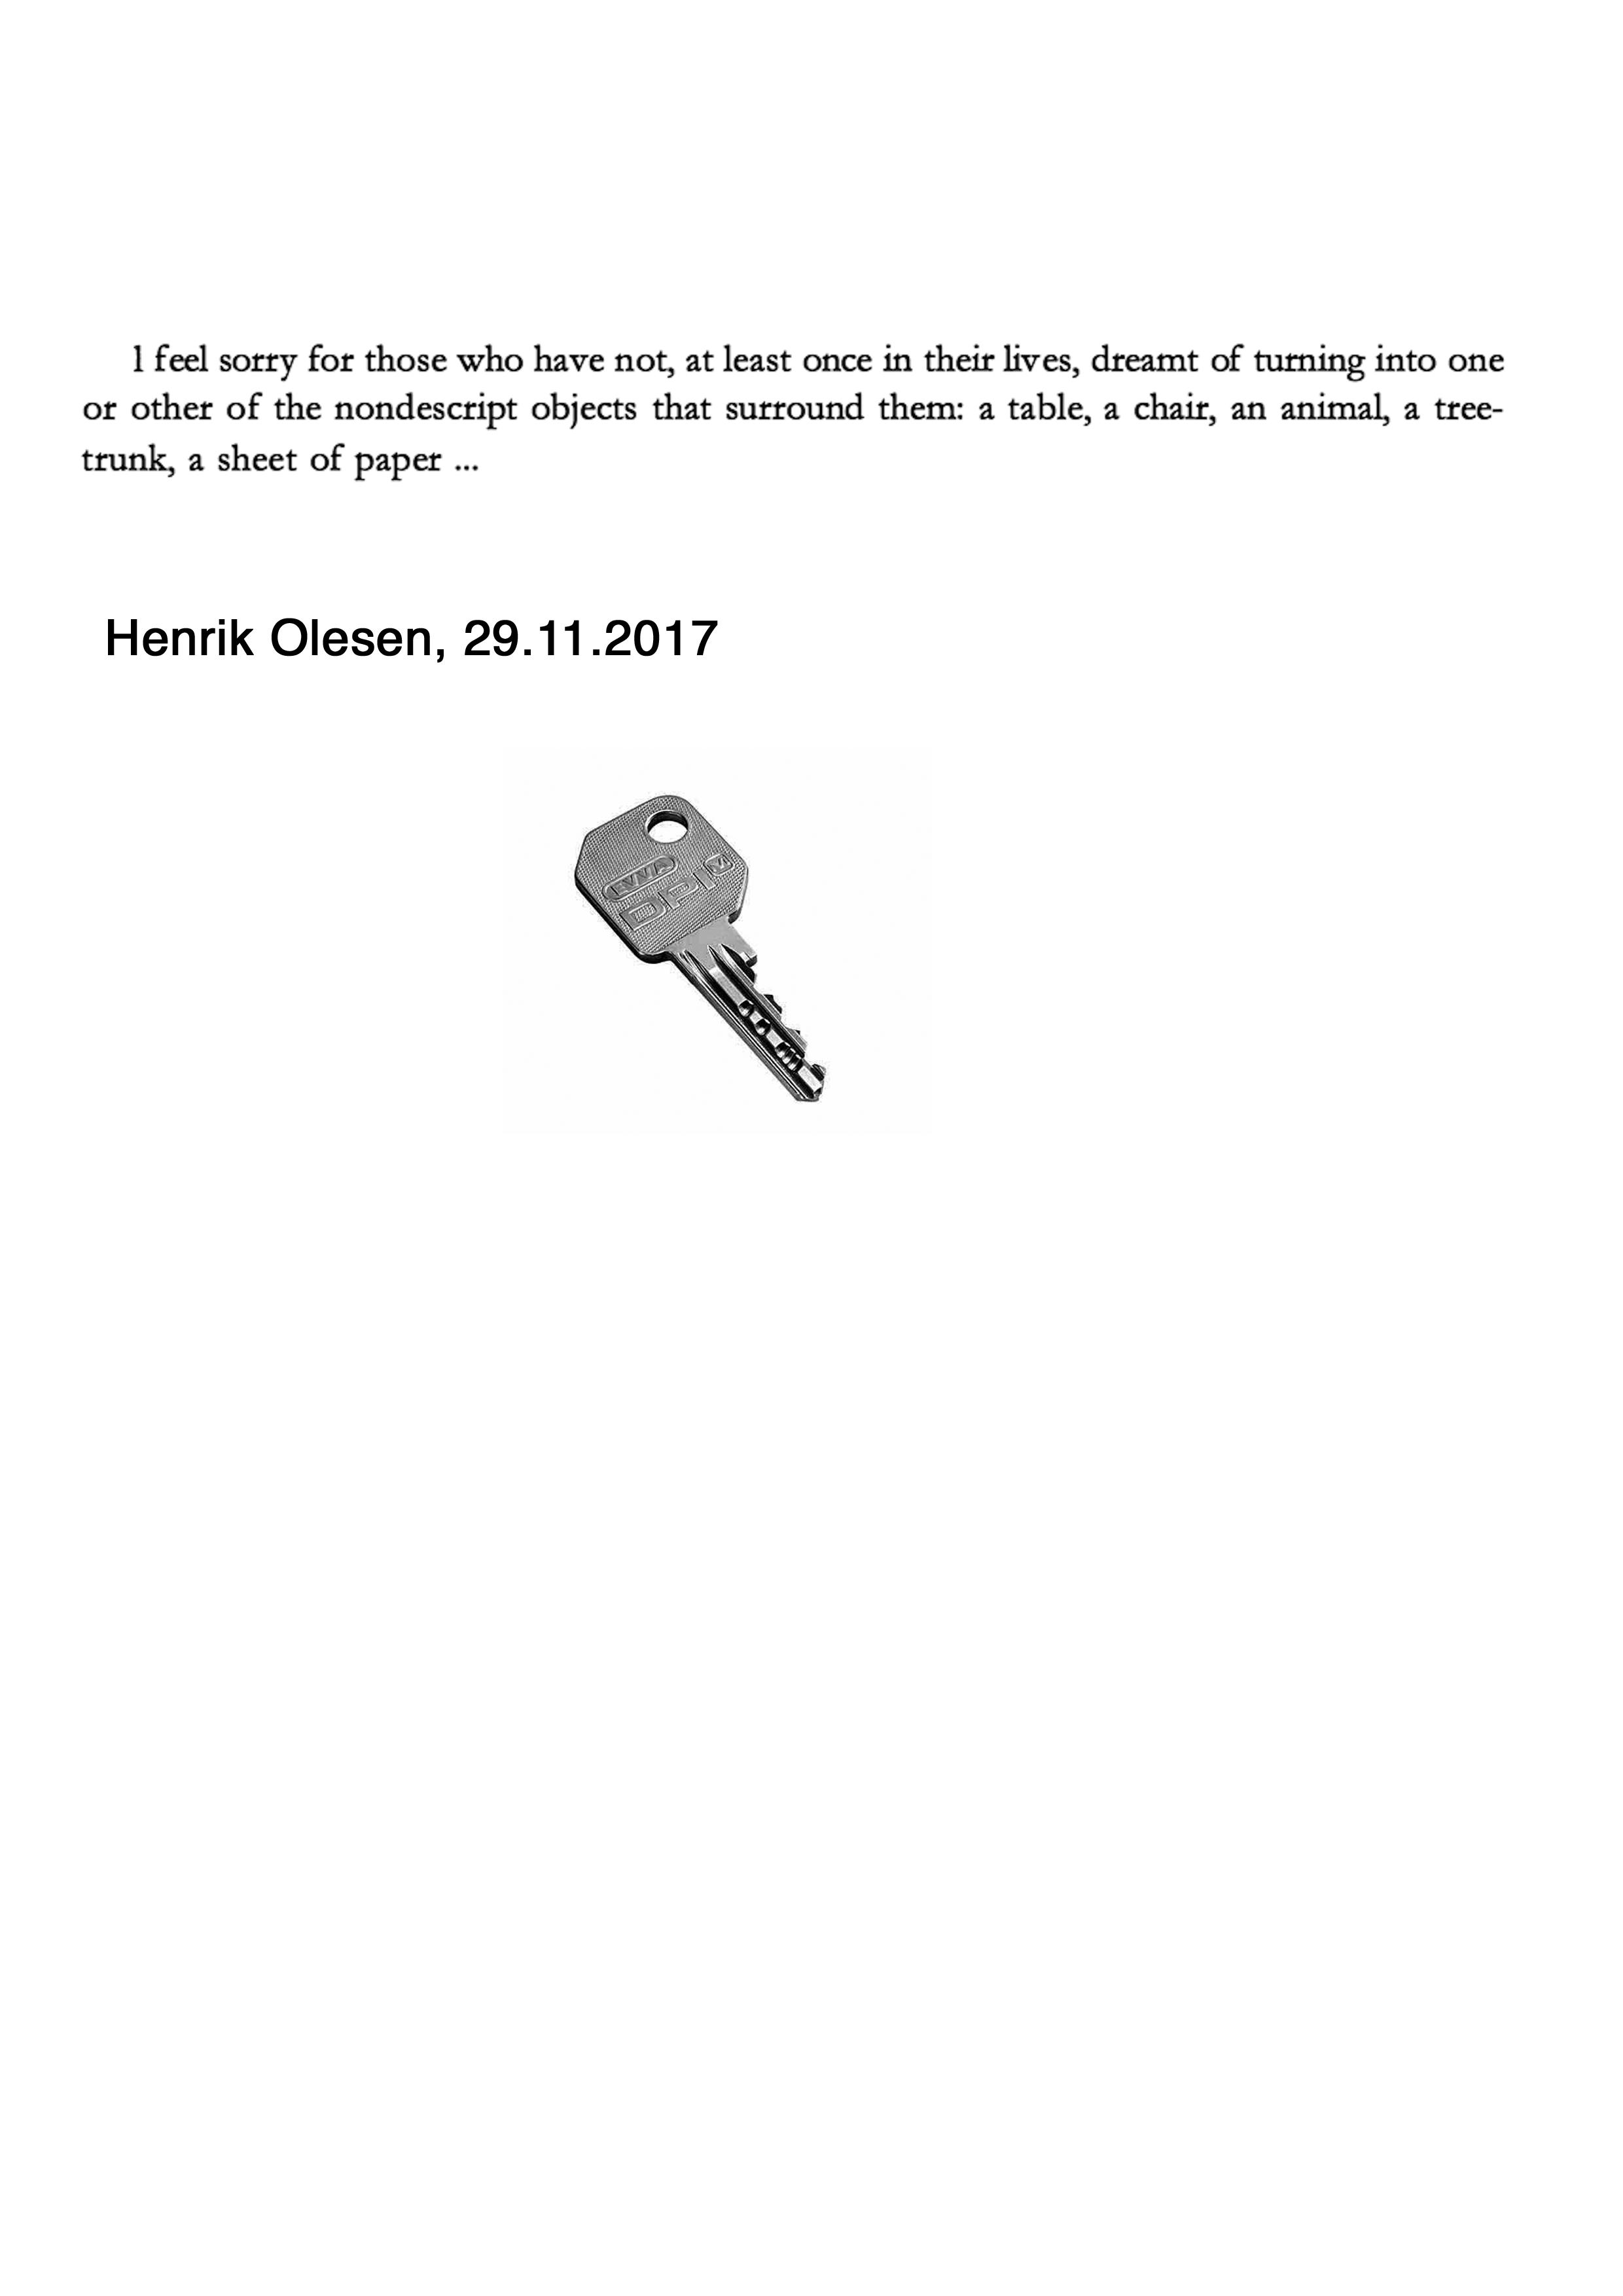 Henrik Olesen